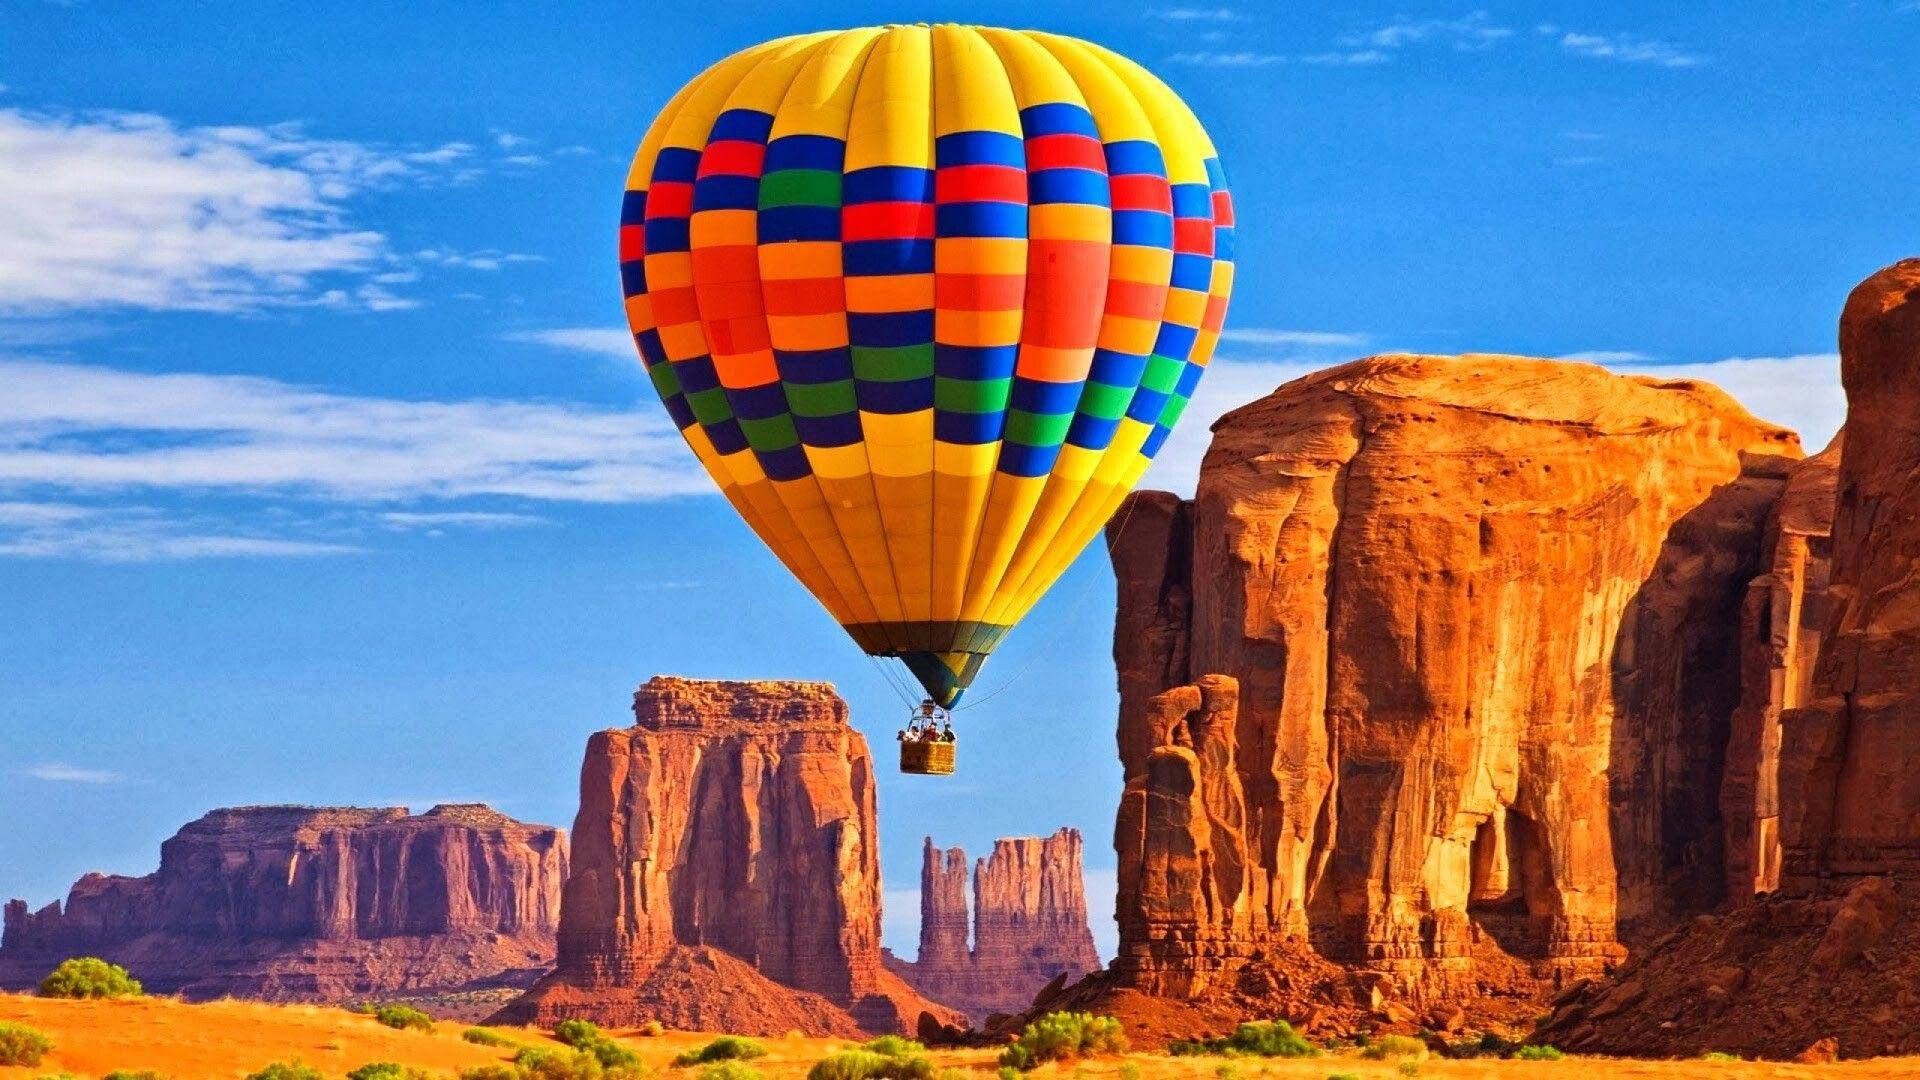 Riding A Hot Air Balloon in Grand Canyon Air balloon